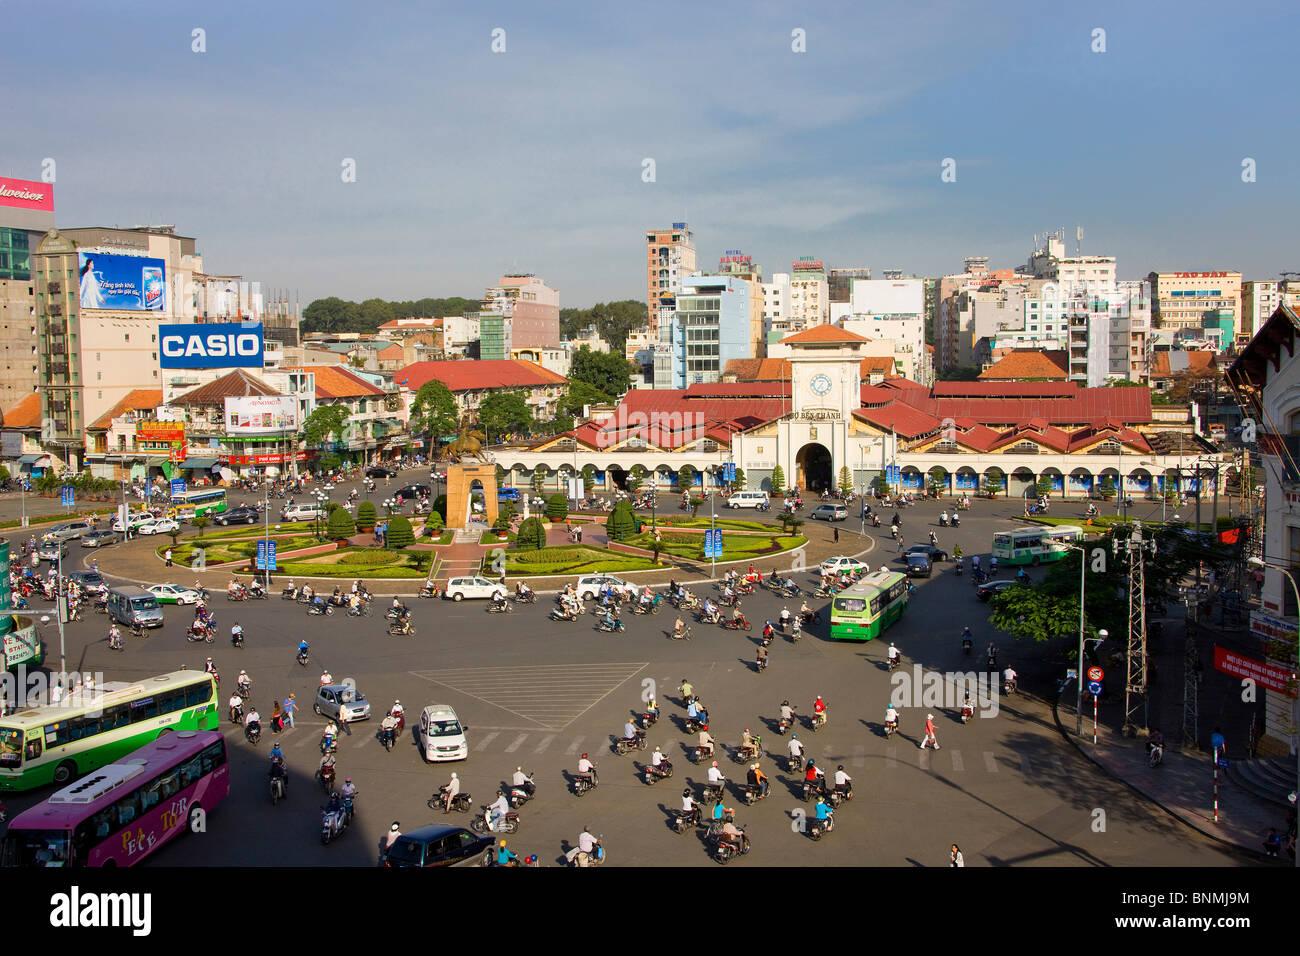 Saigon Ho Chi Minh town city Vietnam market Ben Tanh place space Asia traveling place of interest landmark - Stock Image